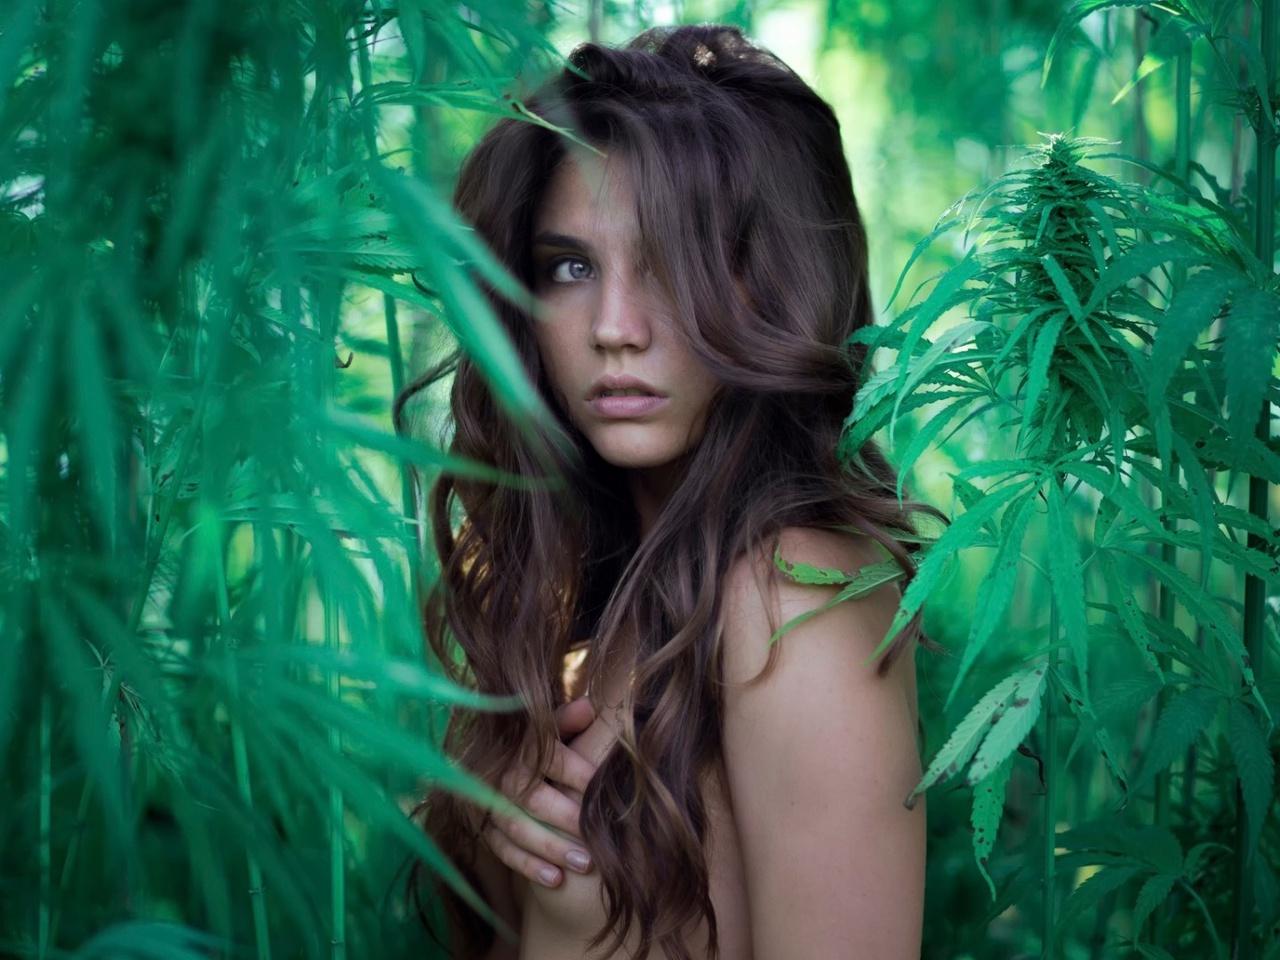 обнажена, девушка, зелень, канапля, взгляд, naked